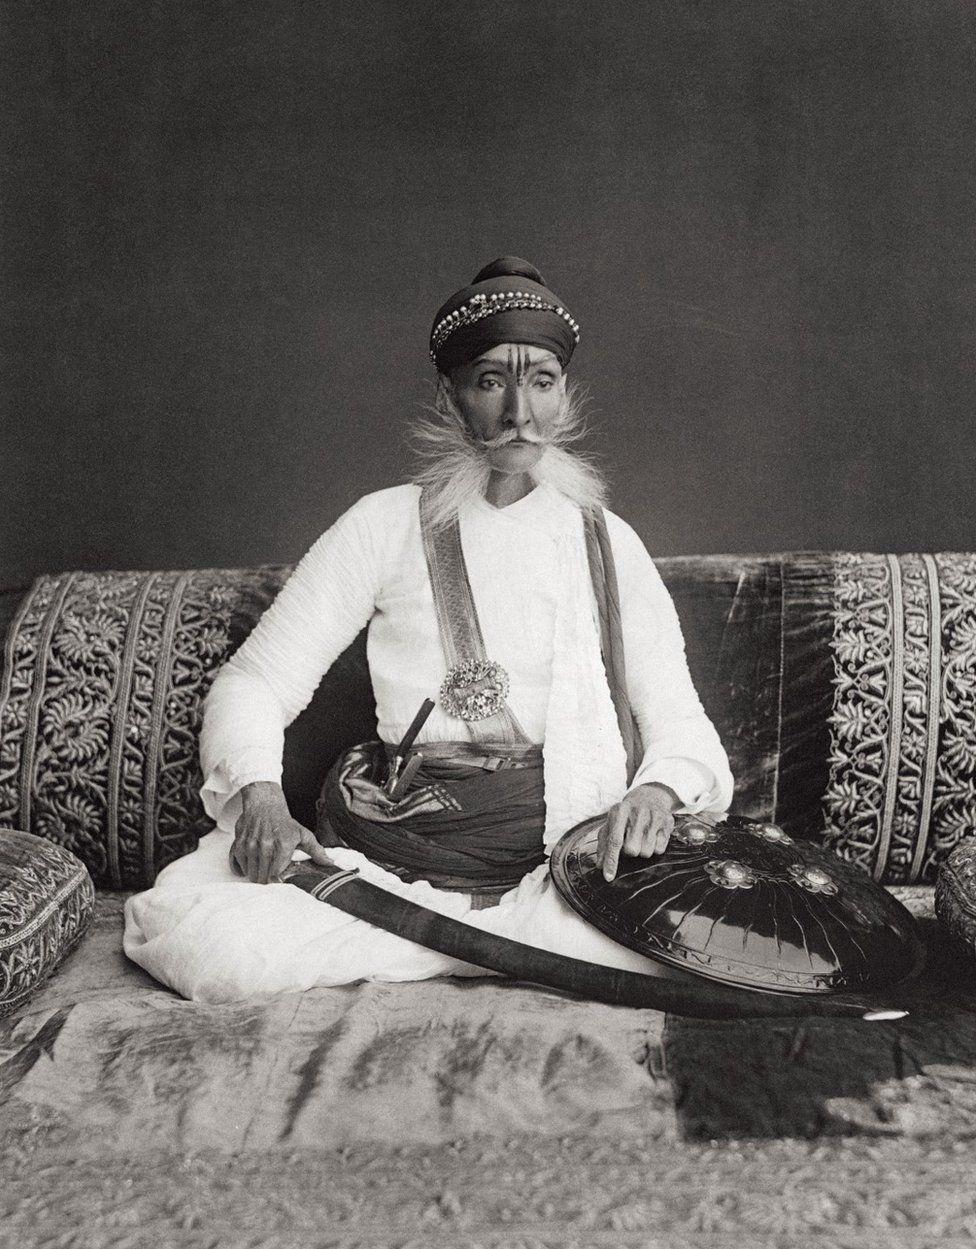 A portrait of H.H The Maharajah Sahib of Bundi